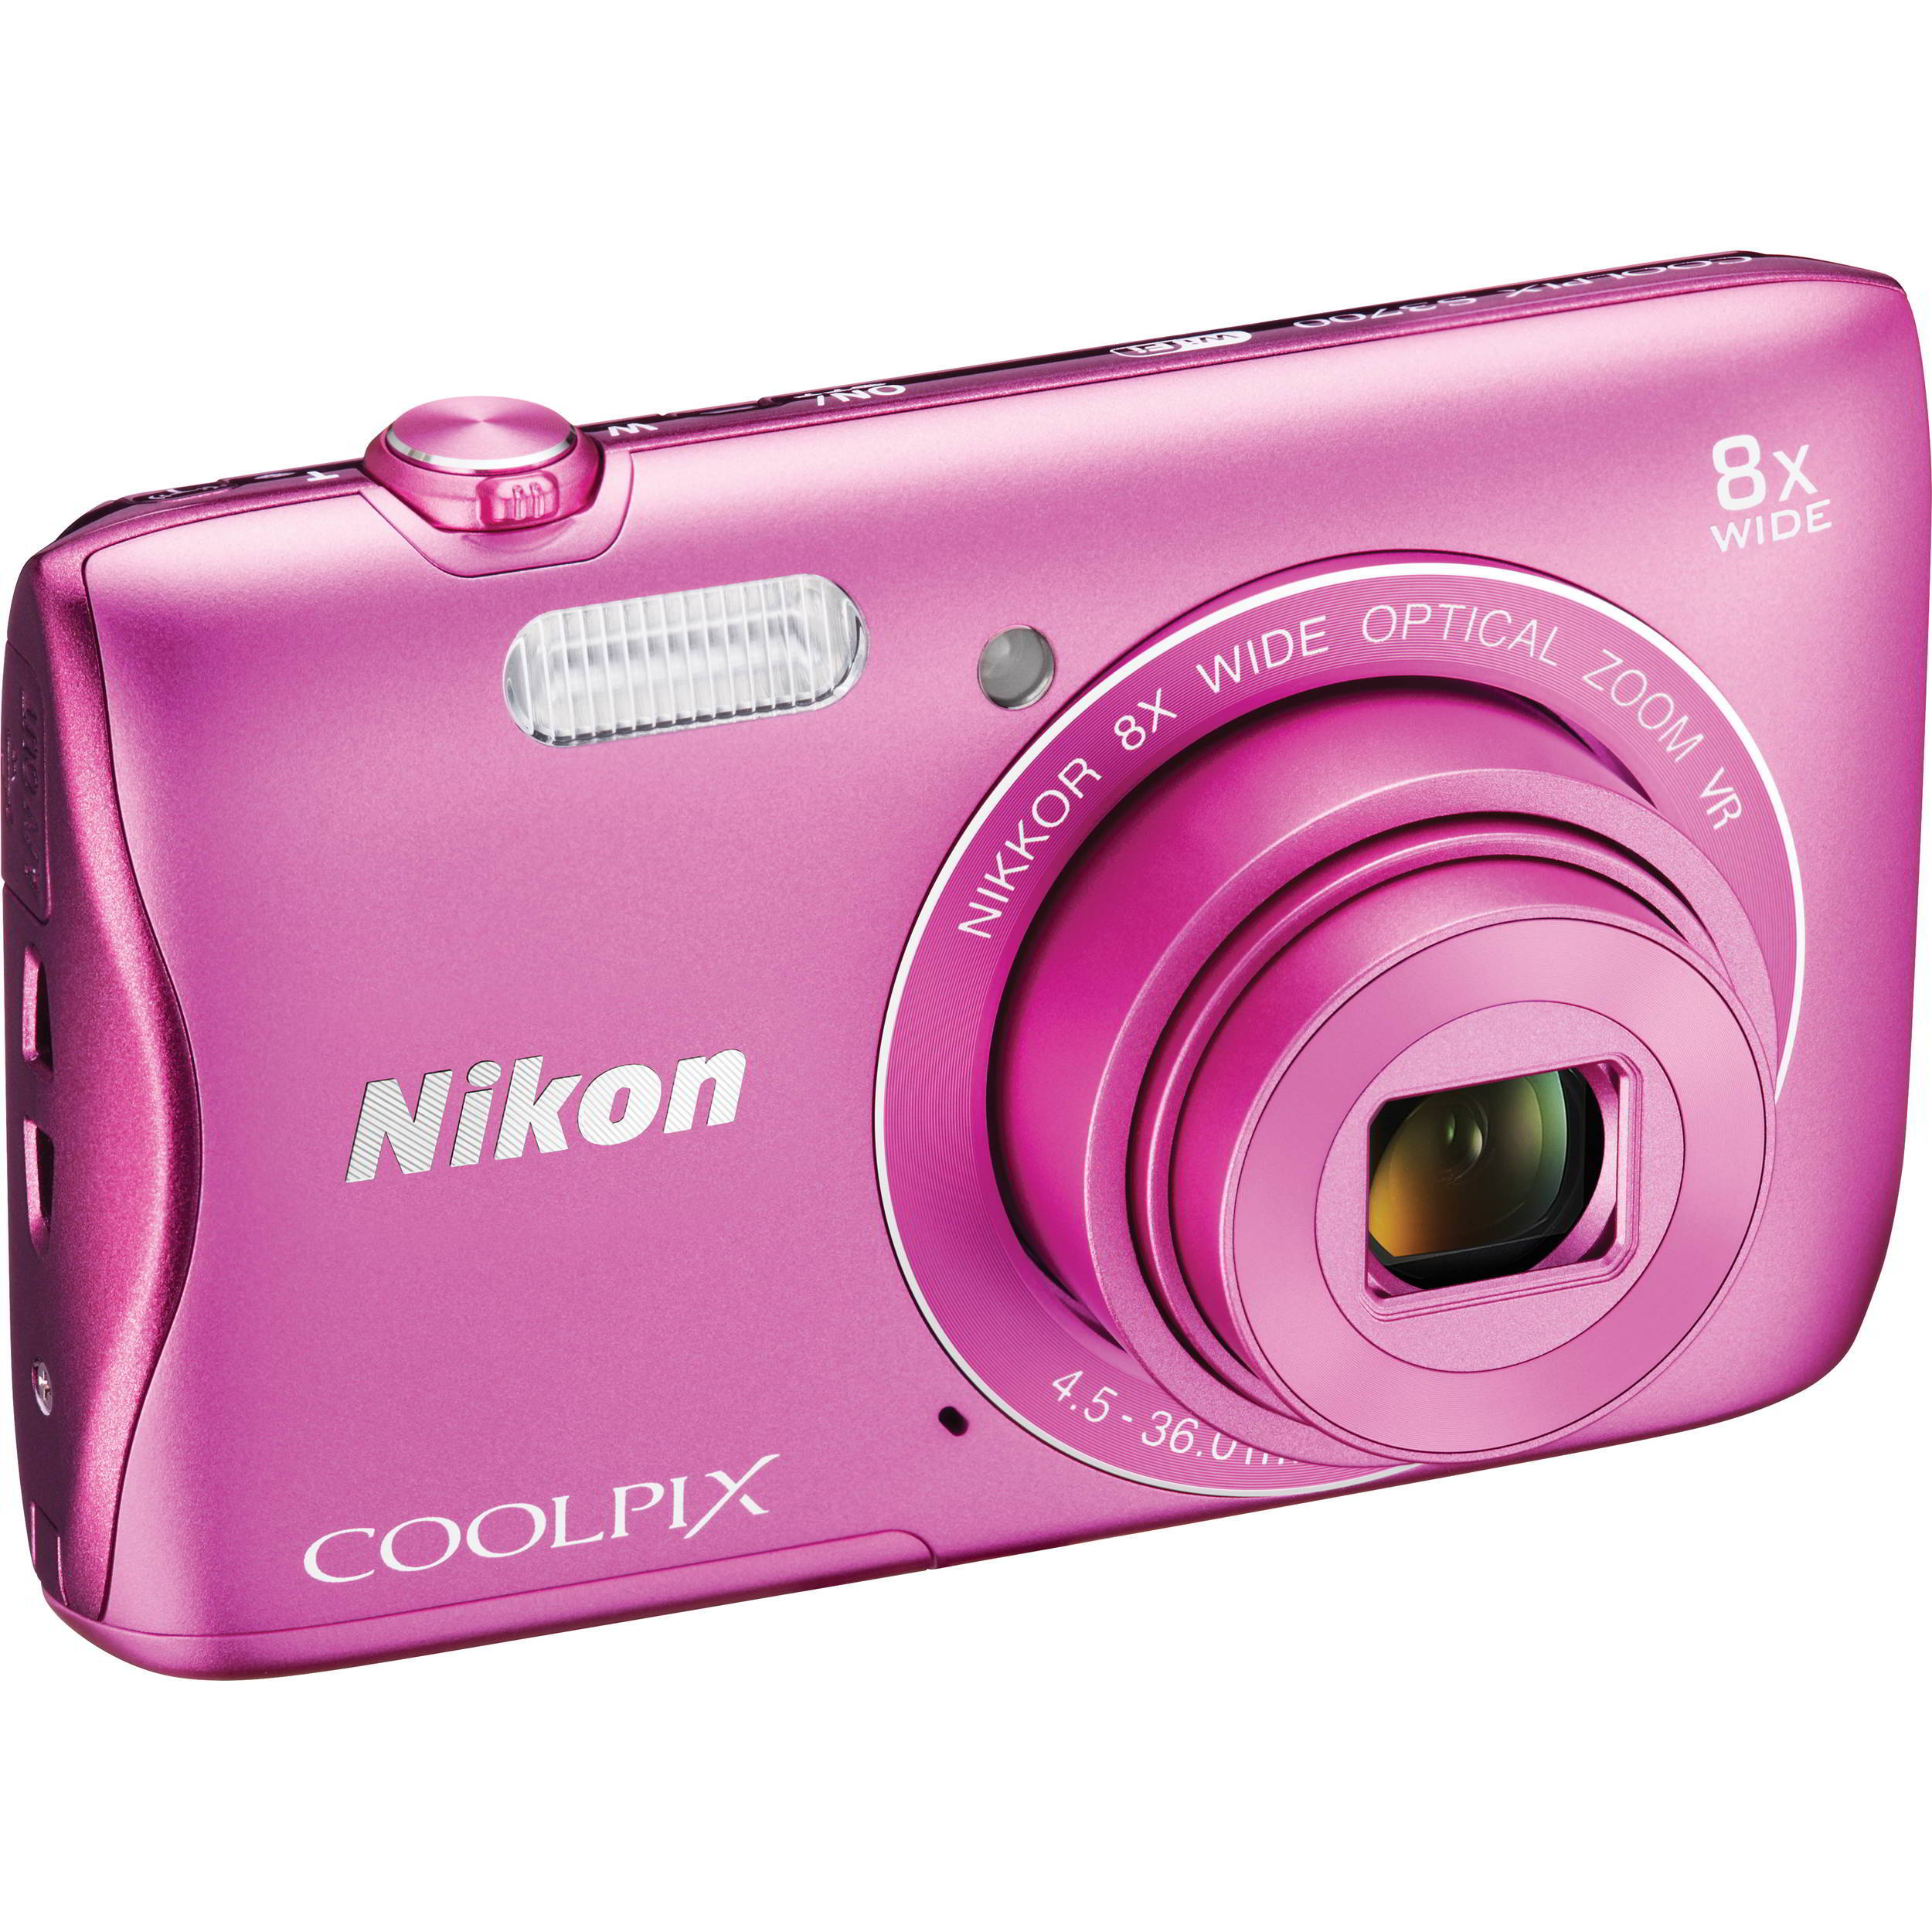 Coolpix S3700 Pink